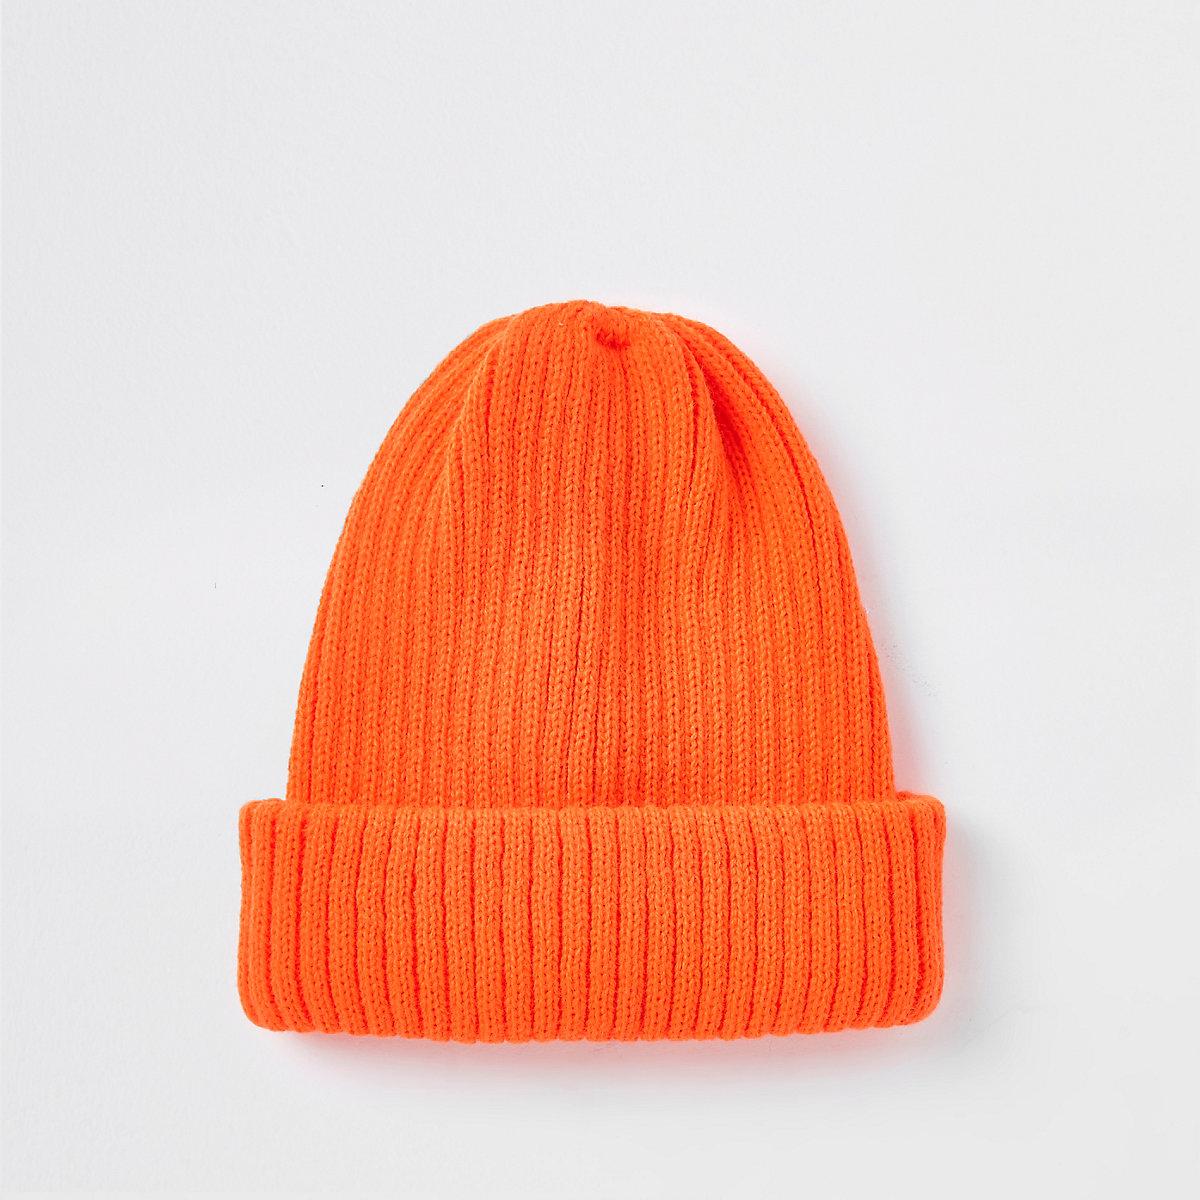 Neon orange fisherman knit beanie hat